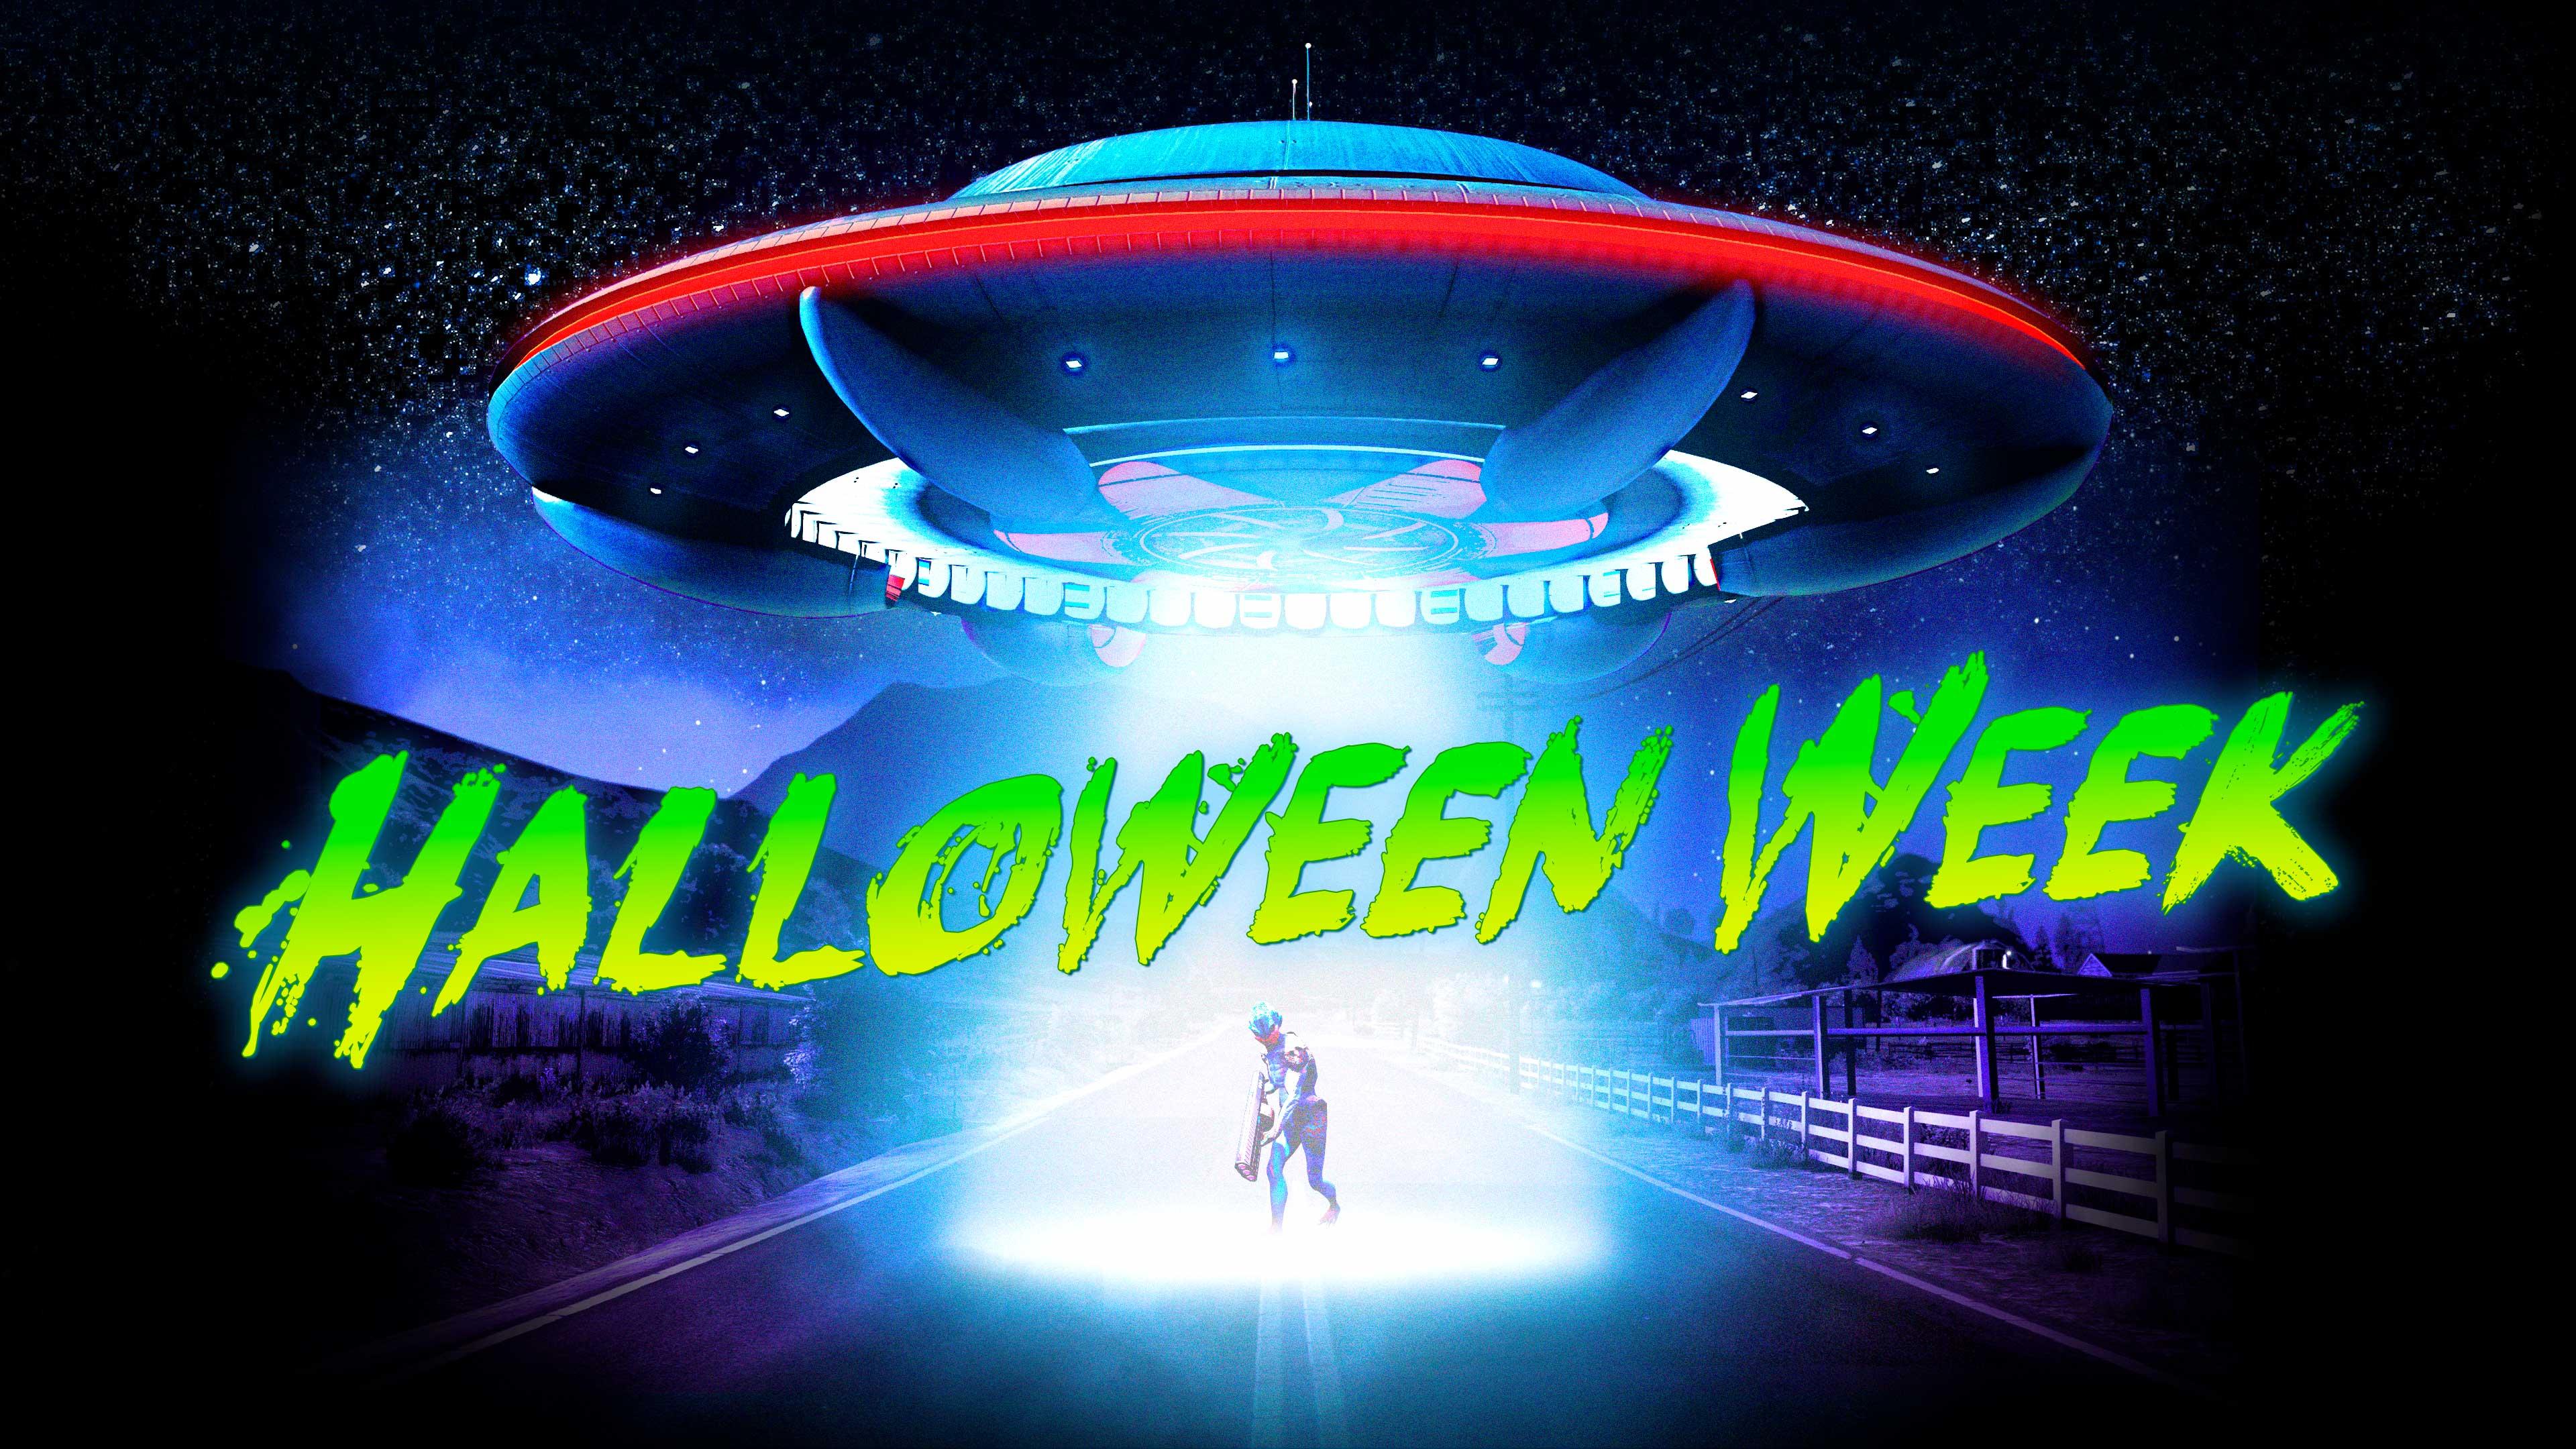 GTA Online Ricompense Gratis Settimana di Halloween